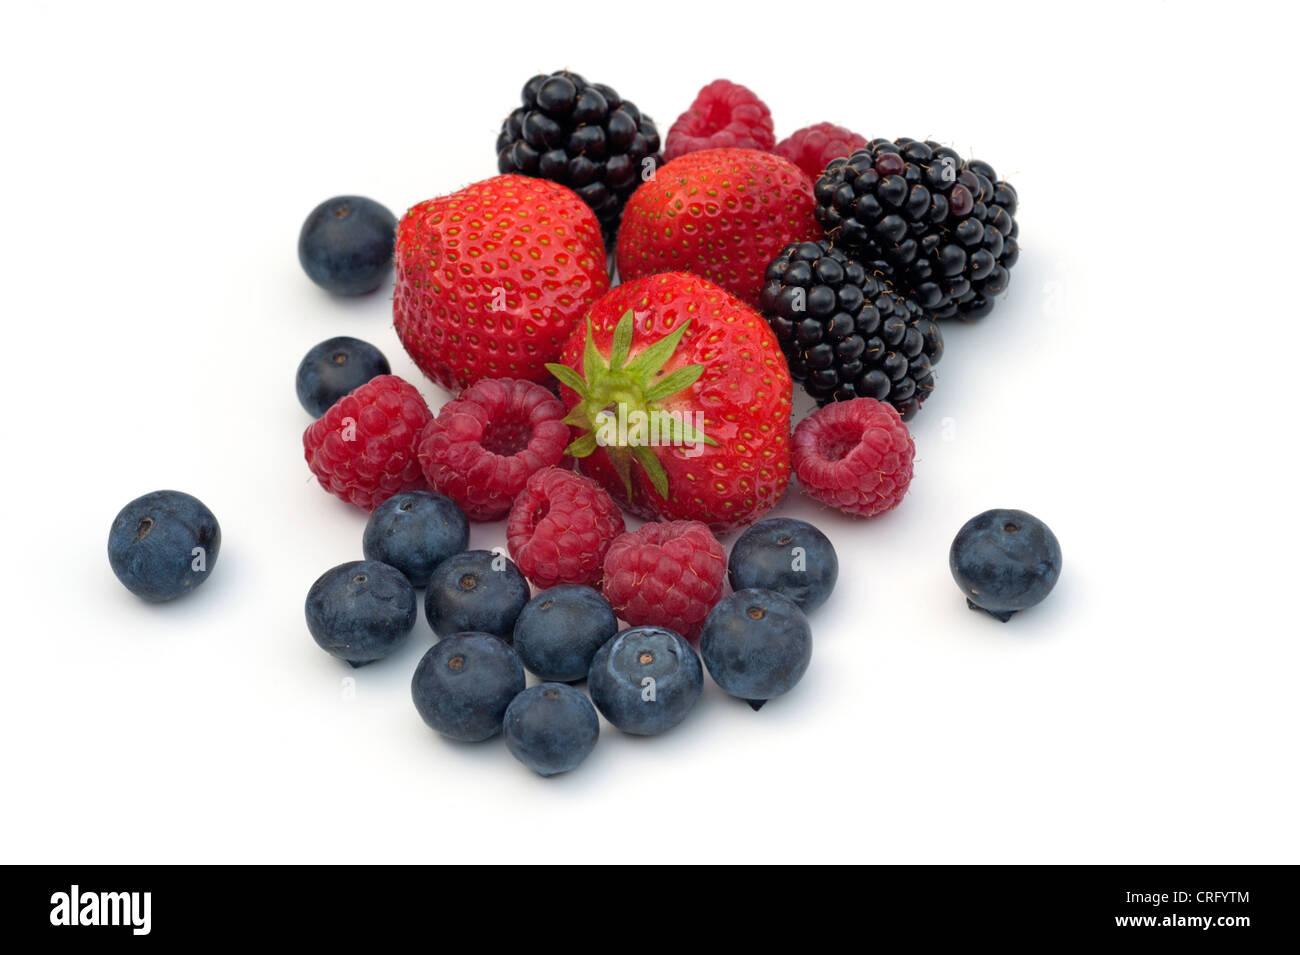 Assortment of berries - Stock Image